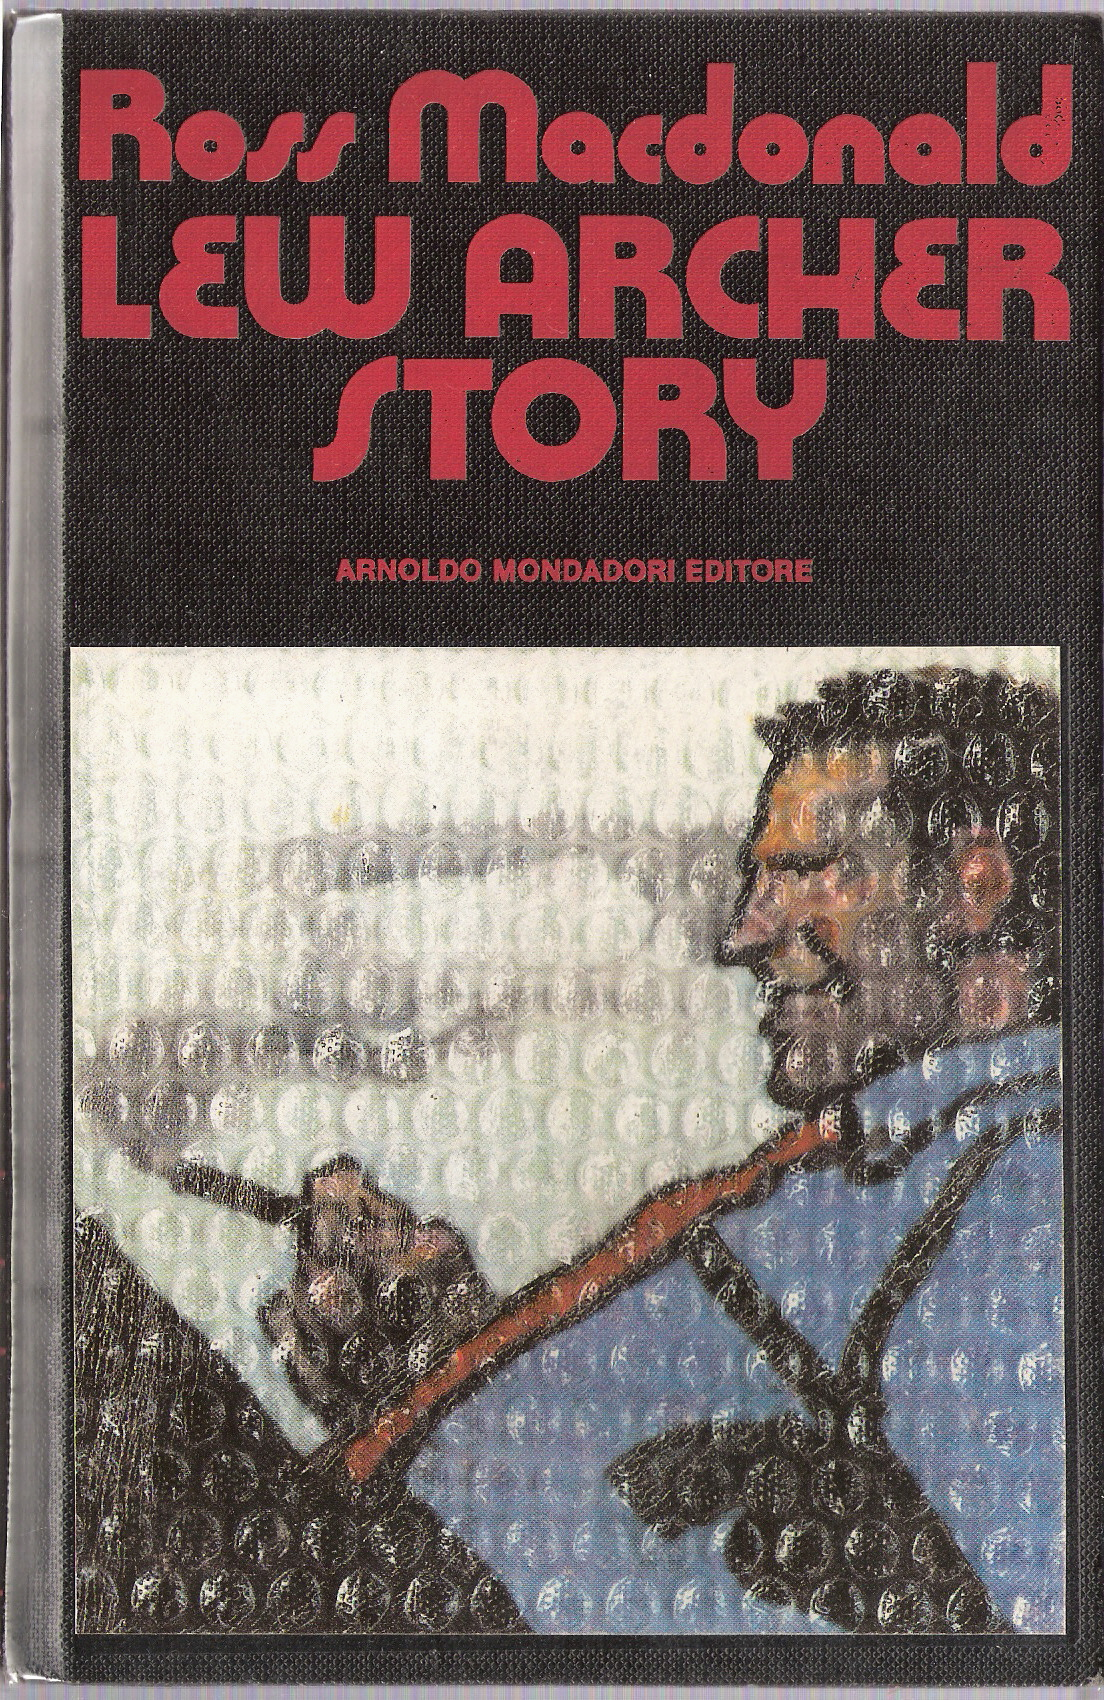 Lew Archer story